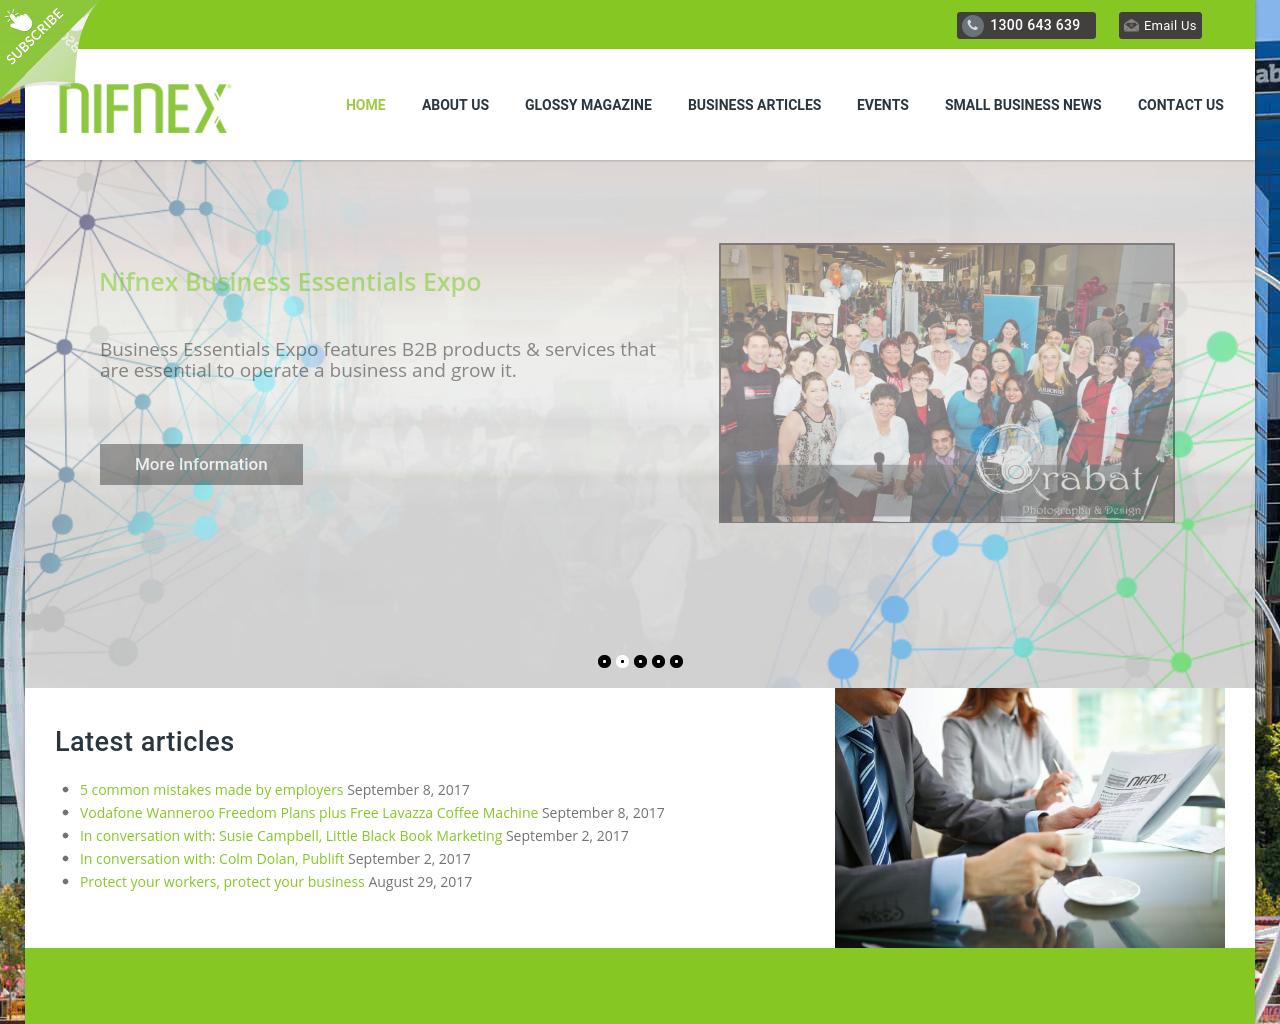 Nifnex-Advertising-Reviews-Pricing